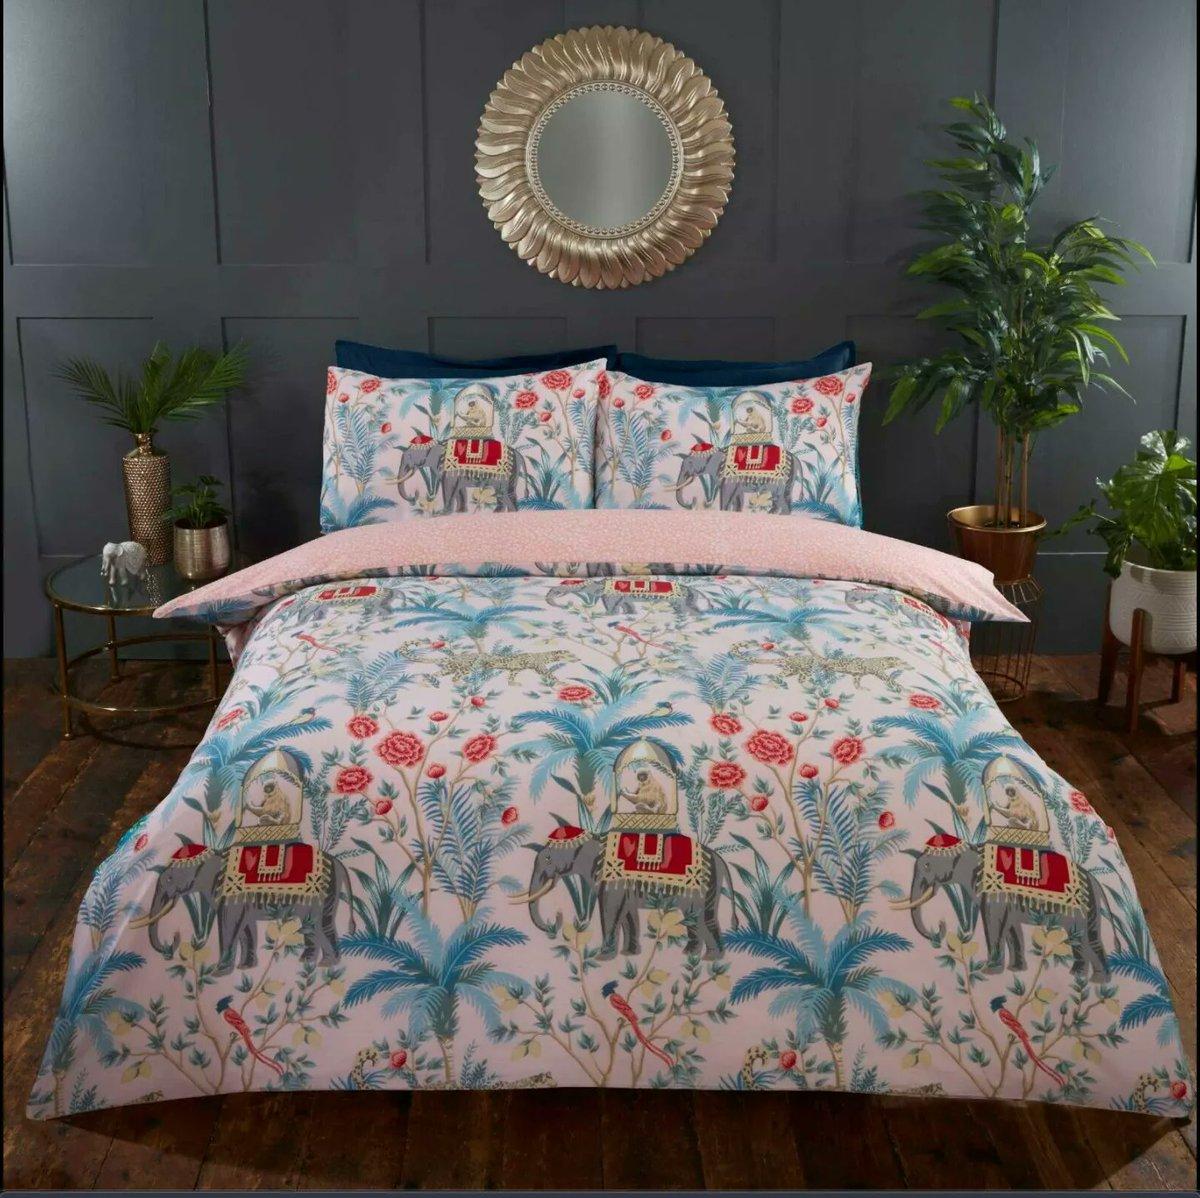 Loving these summer safari design bedding sets, making me feel like I'm on a wild adventure.  Which colour scheme do you prefer?  #YourBizHour #home #Safari #elephants #MHHSBD https://t.co/pzdIOPoYsu